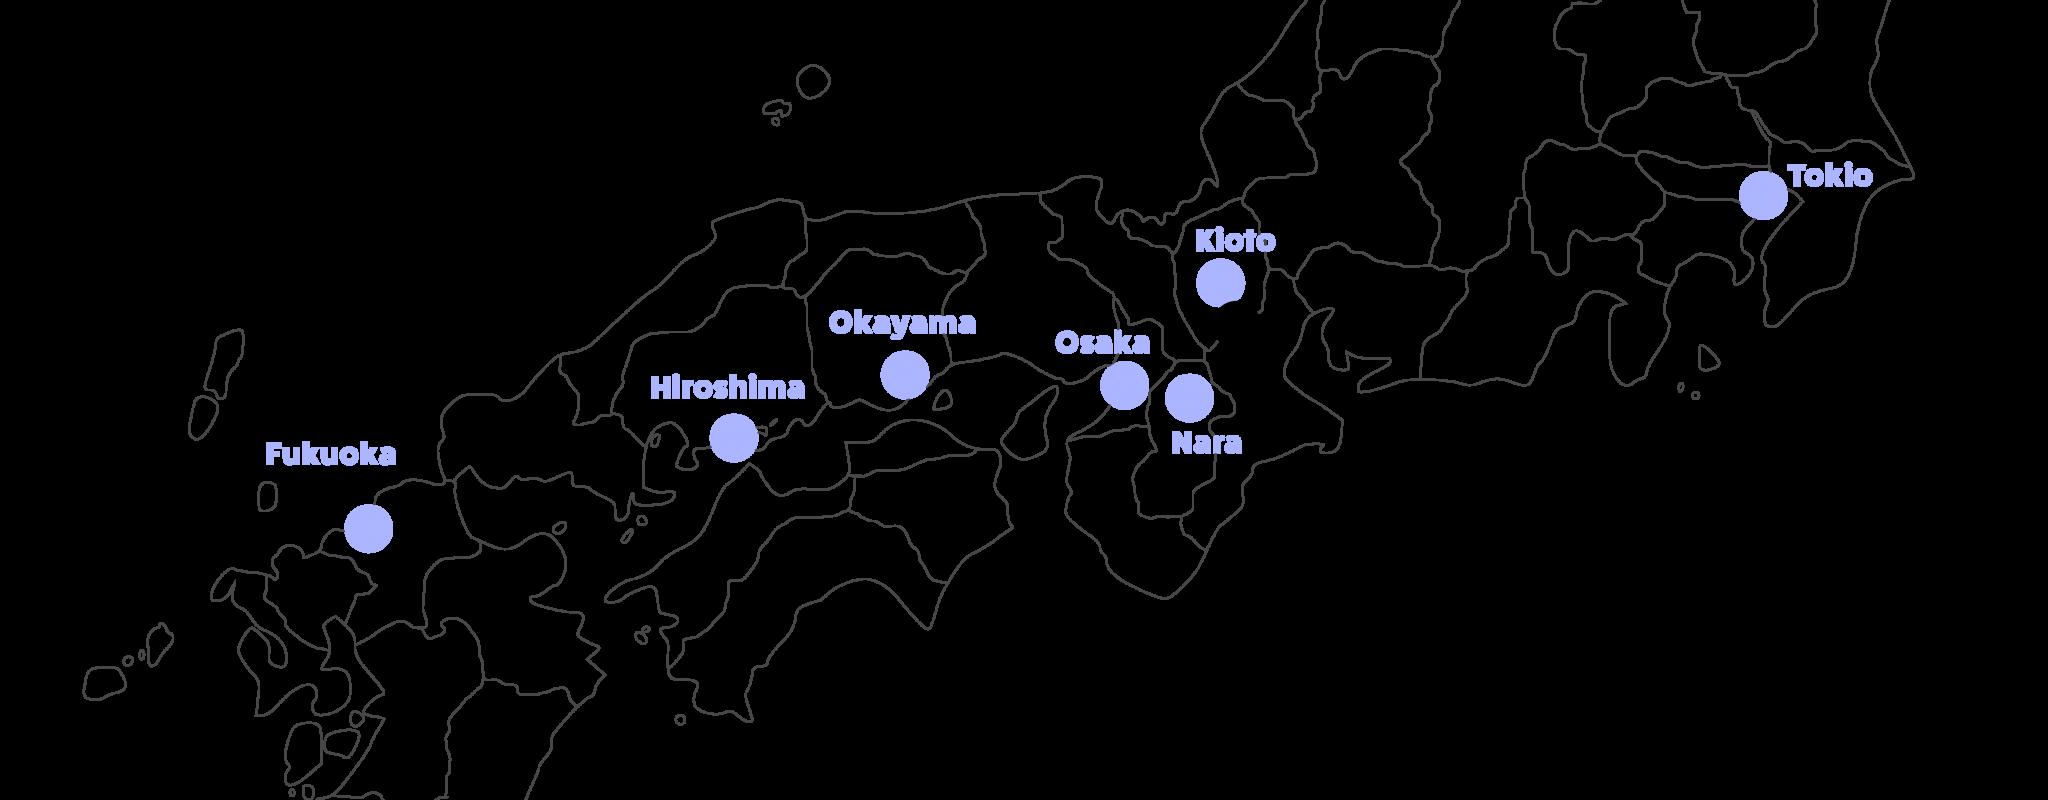 Kartta keski-japanista, korostettuna Uji